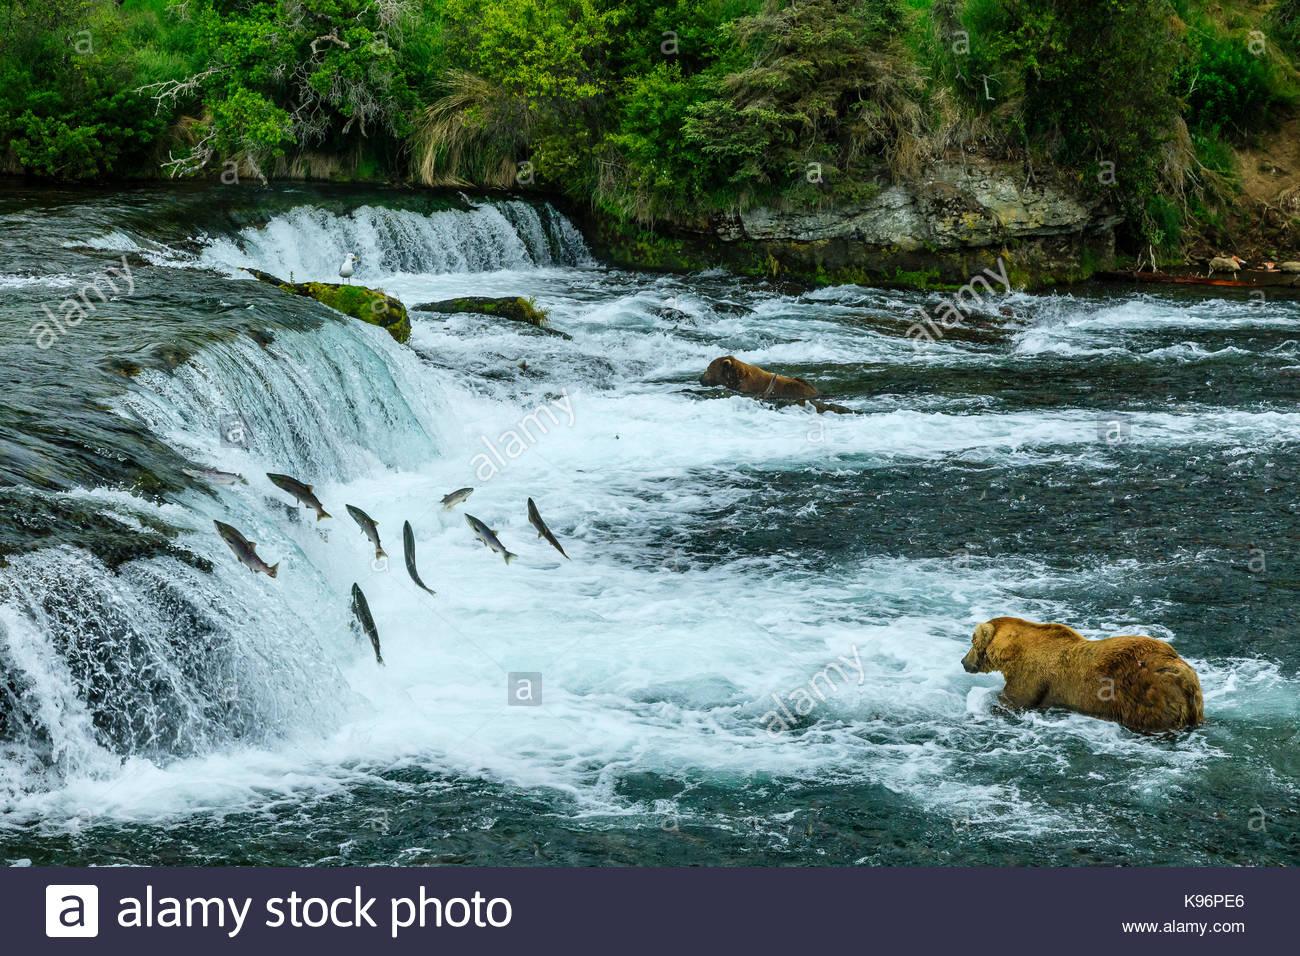 Brown bears, Ursus arctos, fishing for sockeye salmon below Brooks Falls. - Stock Image